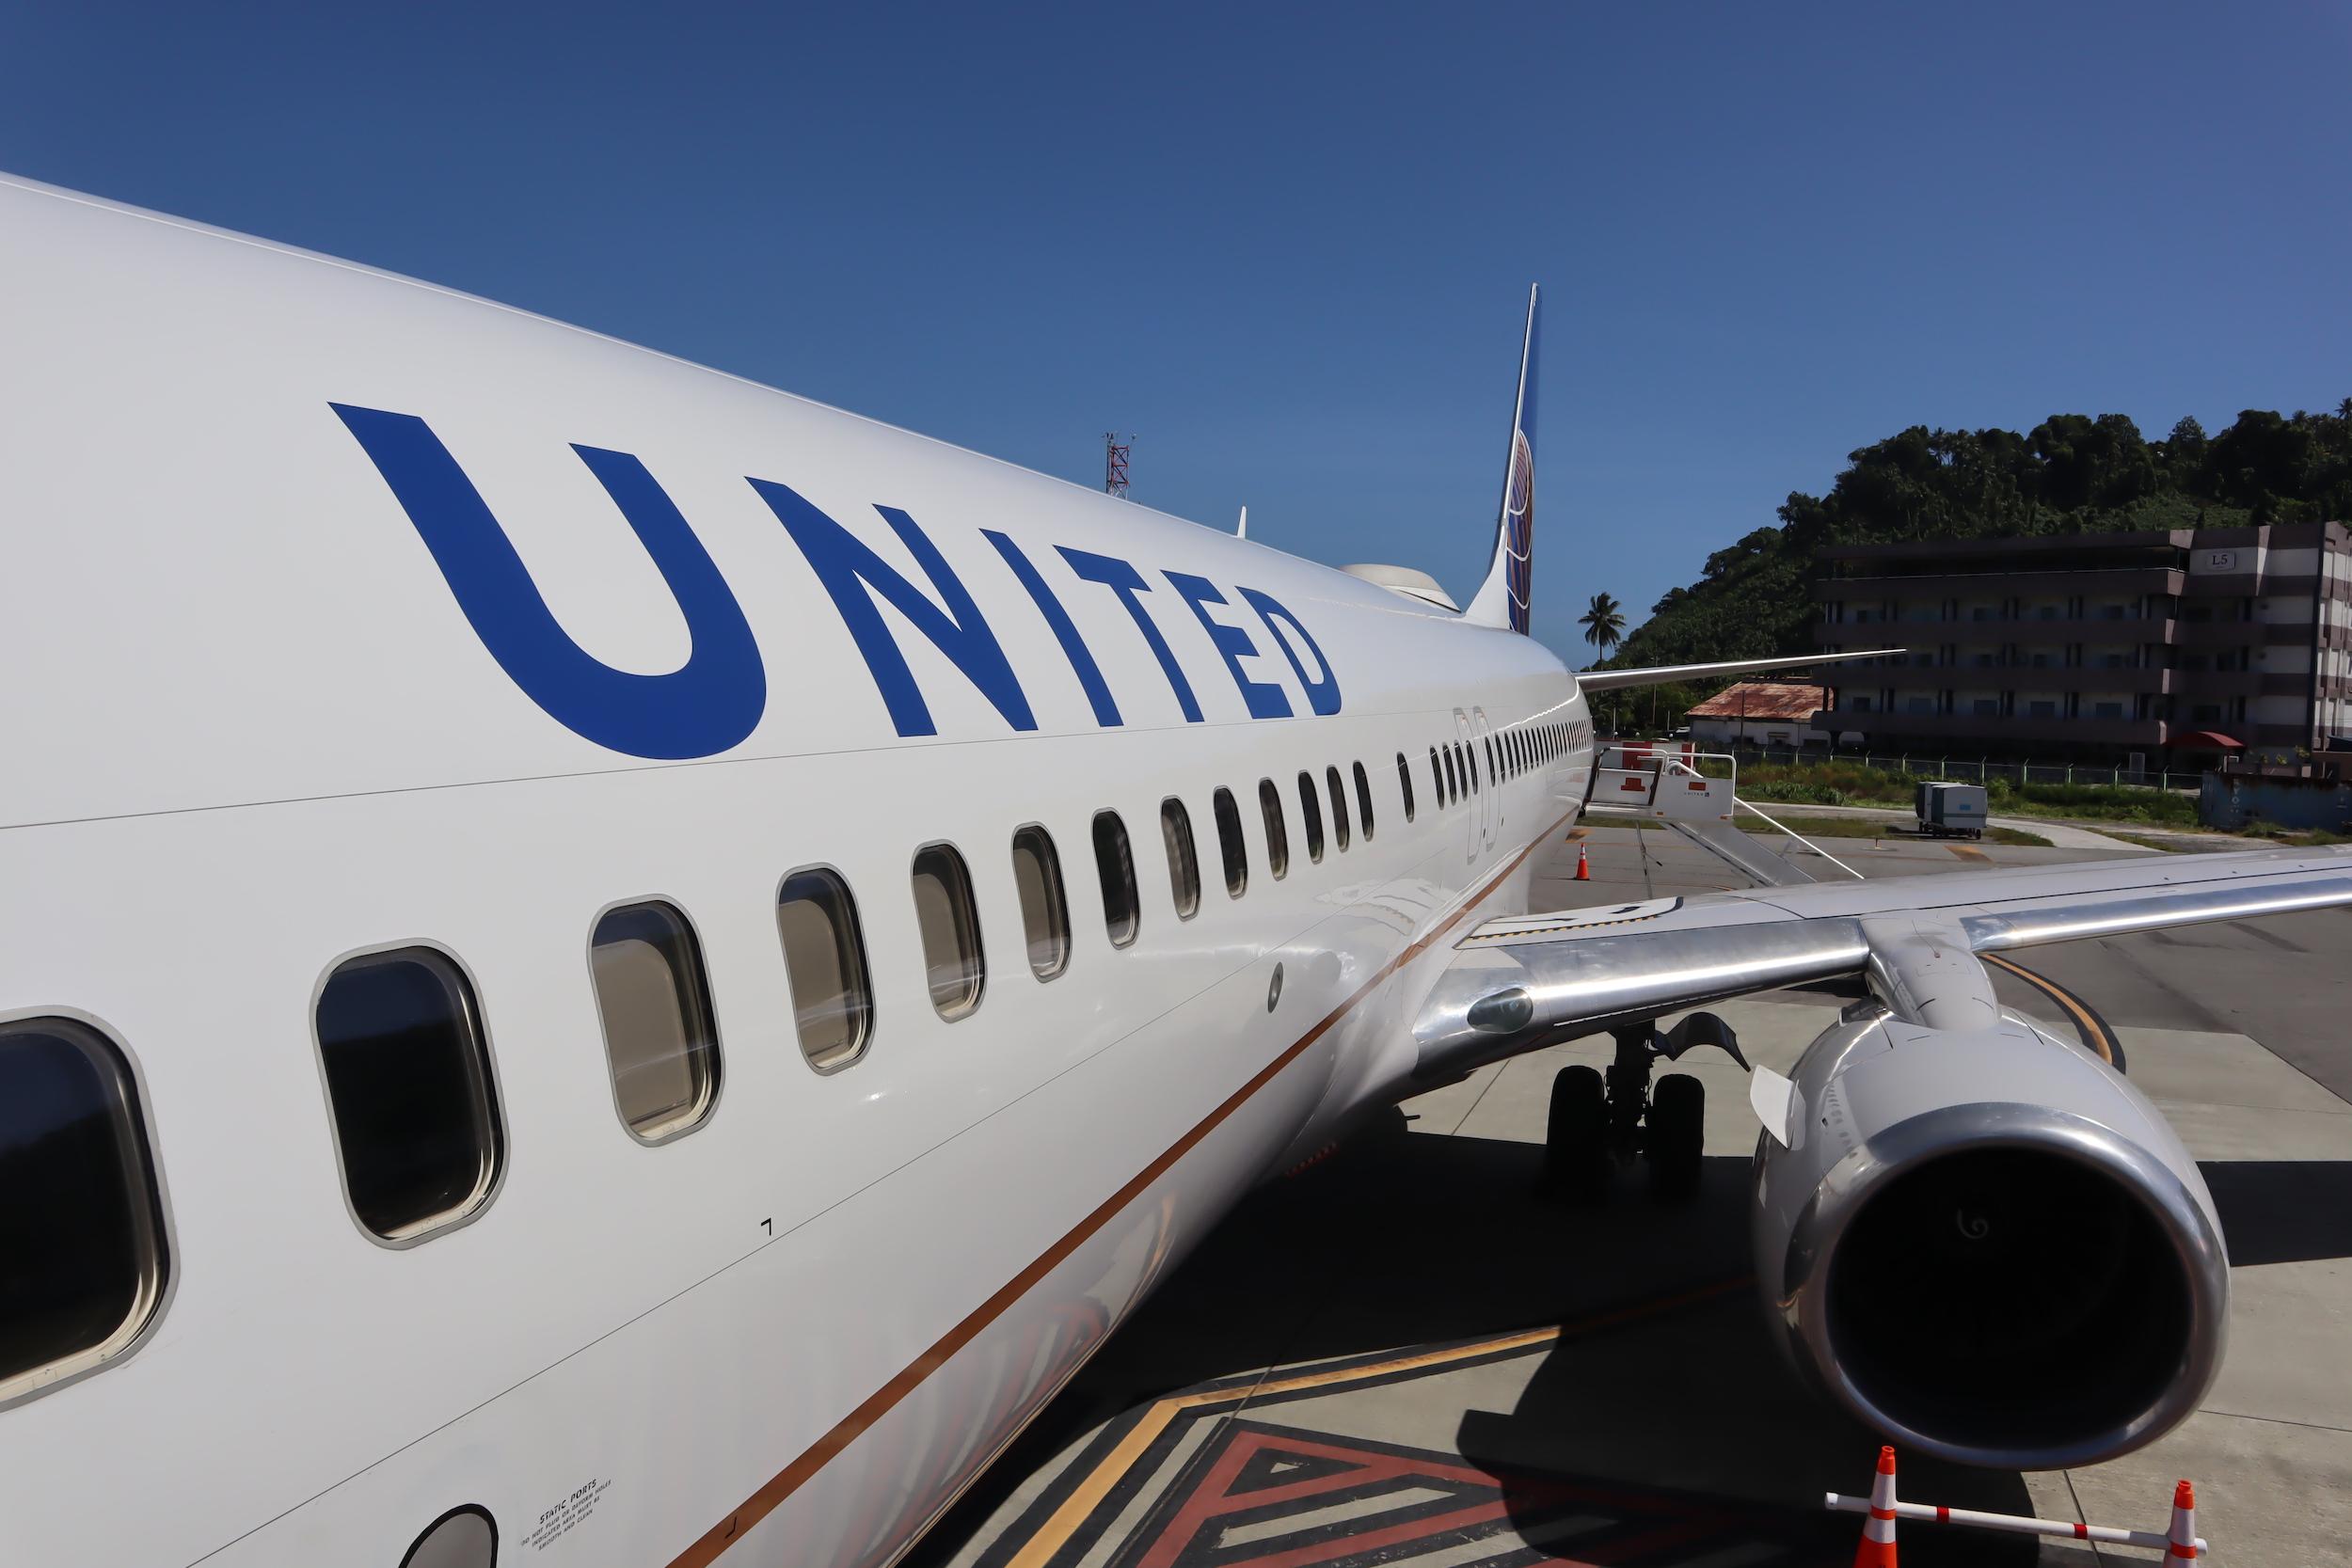 United Flight 176